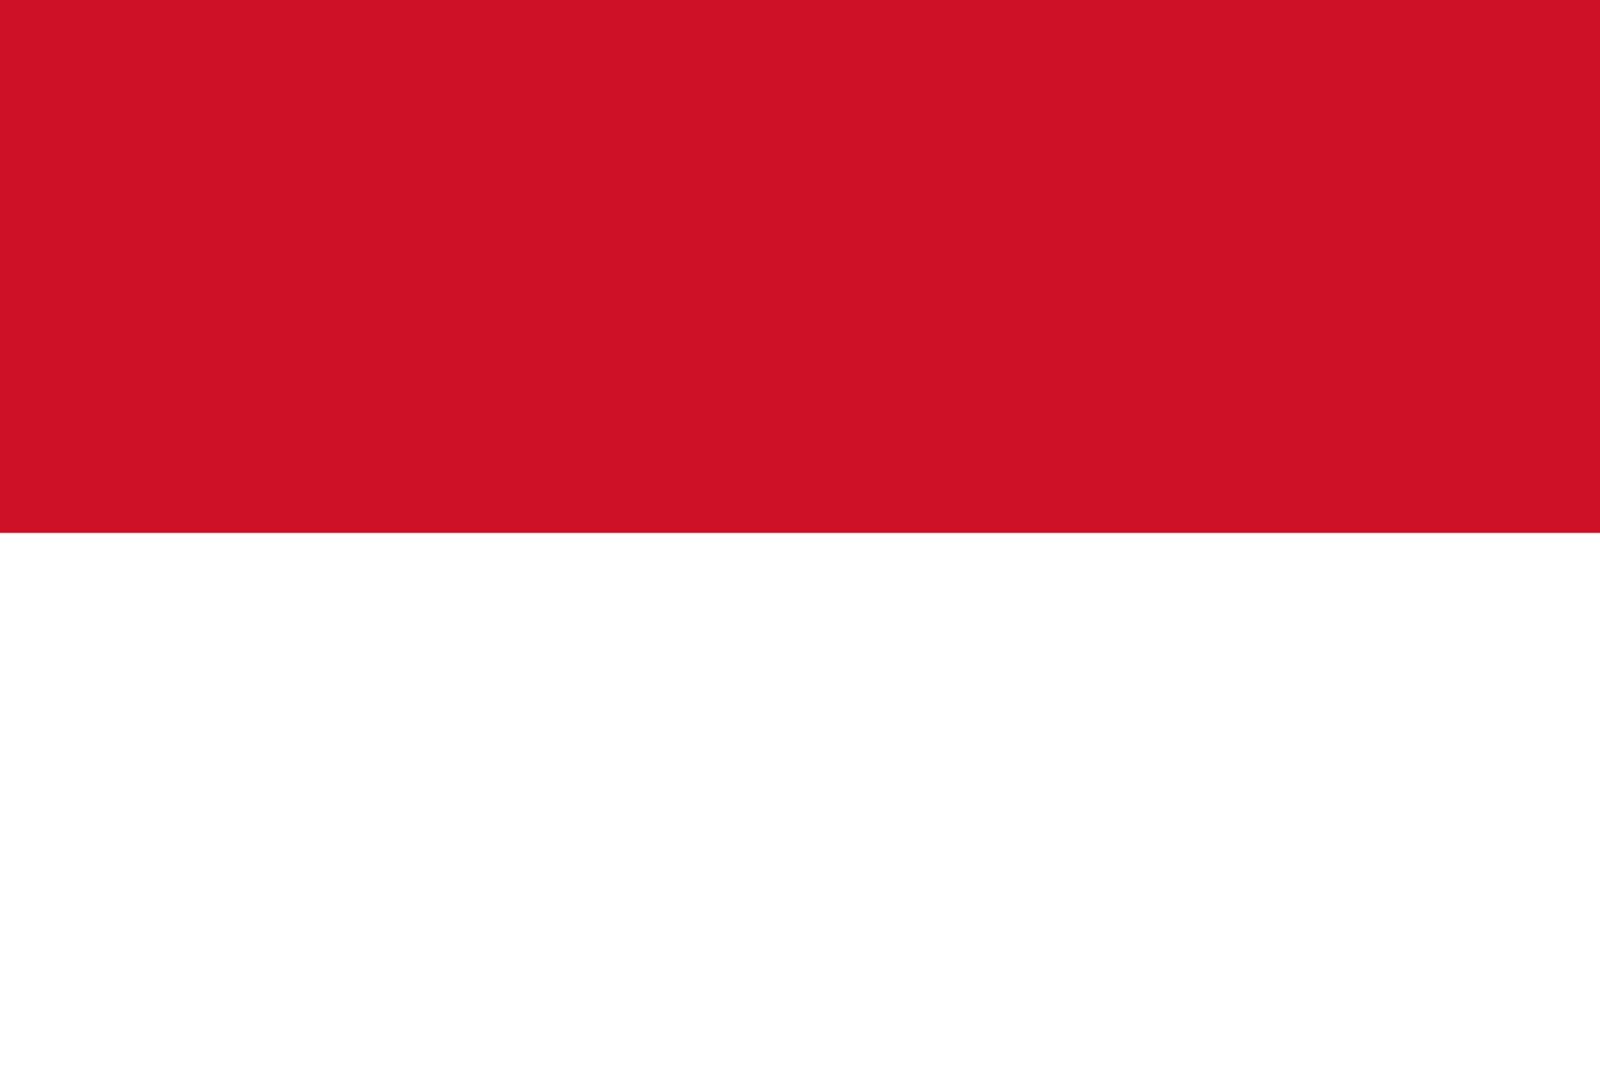 http://carbrandsincurrentproduction.blogspot.com.es/search/label/Indonesia